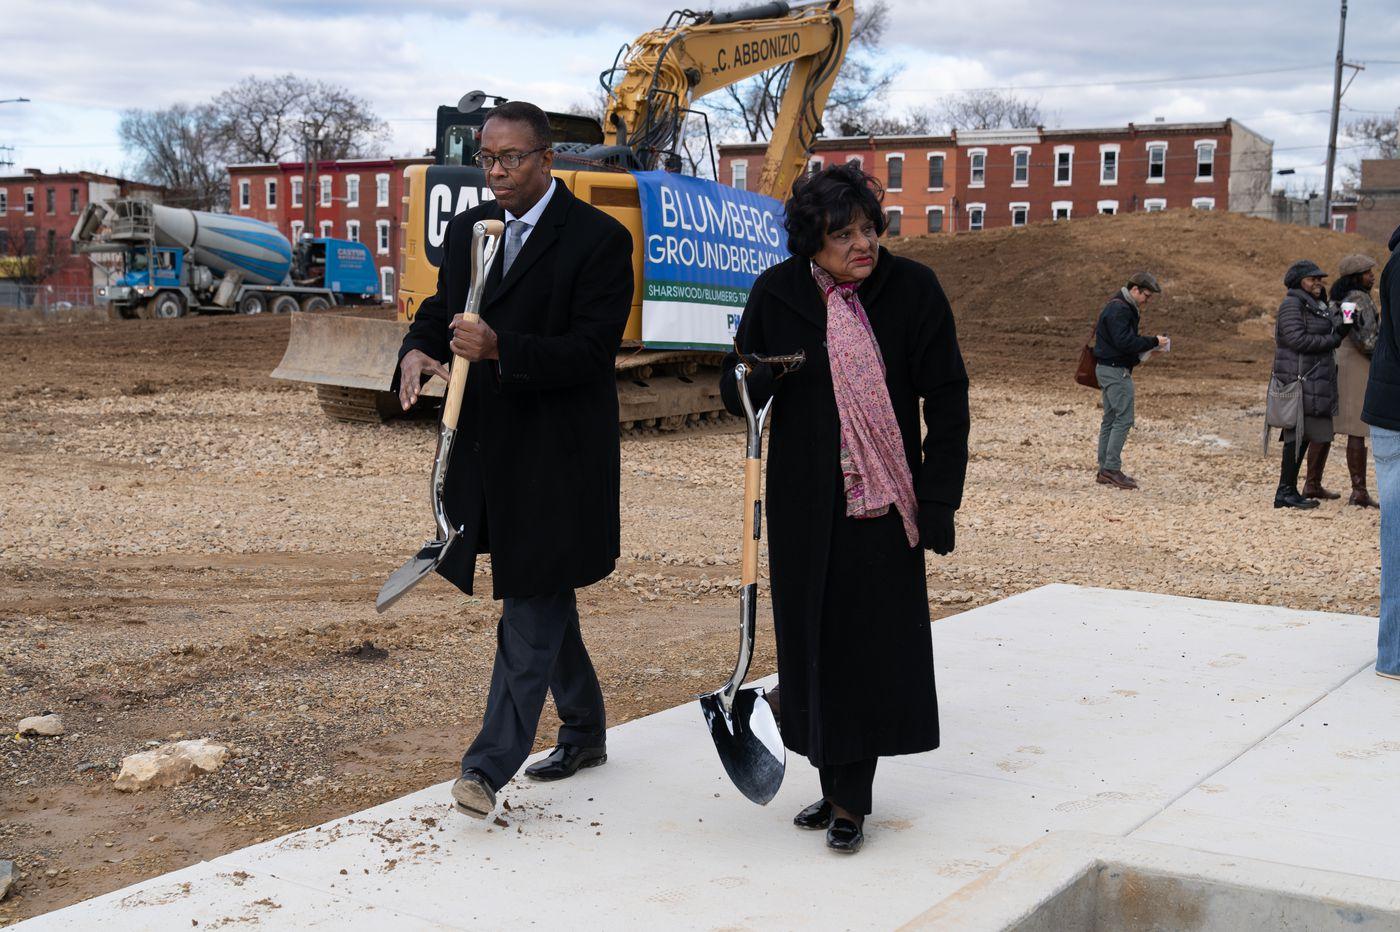 Philadelphia City Council President Darrell Clarke proposes land sales reforms, defends 'councilmanic prerogative'